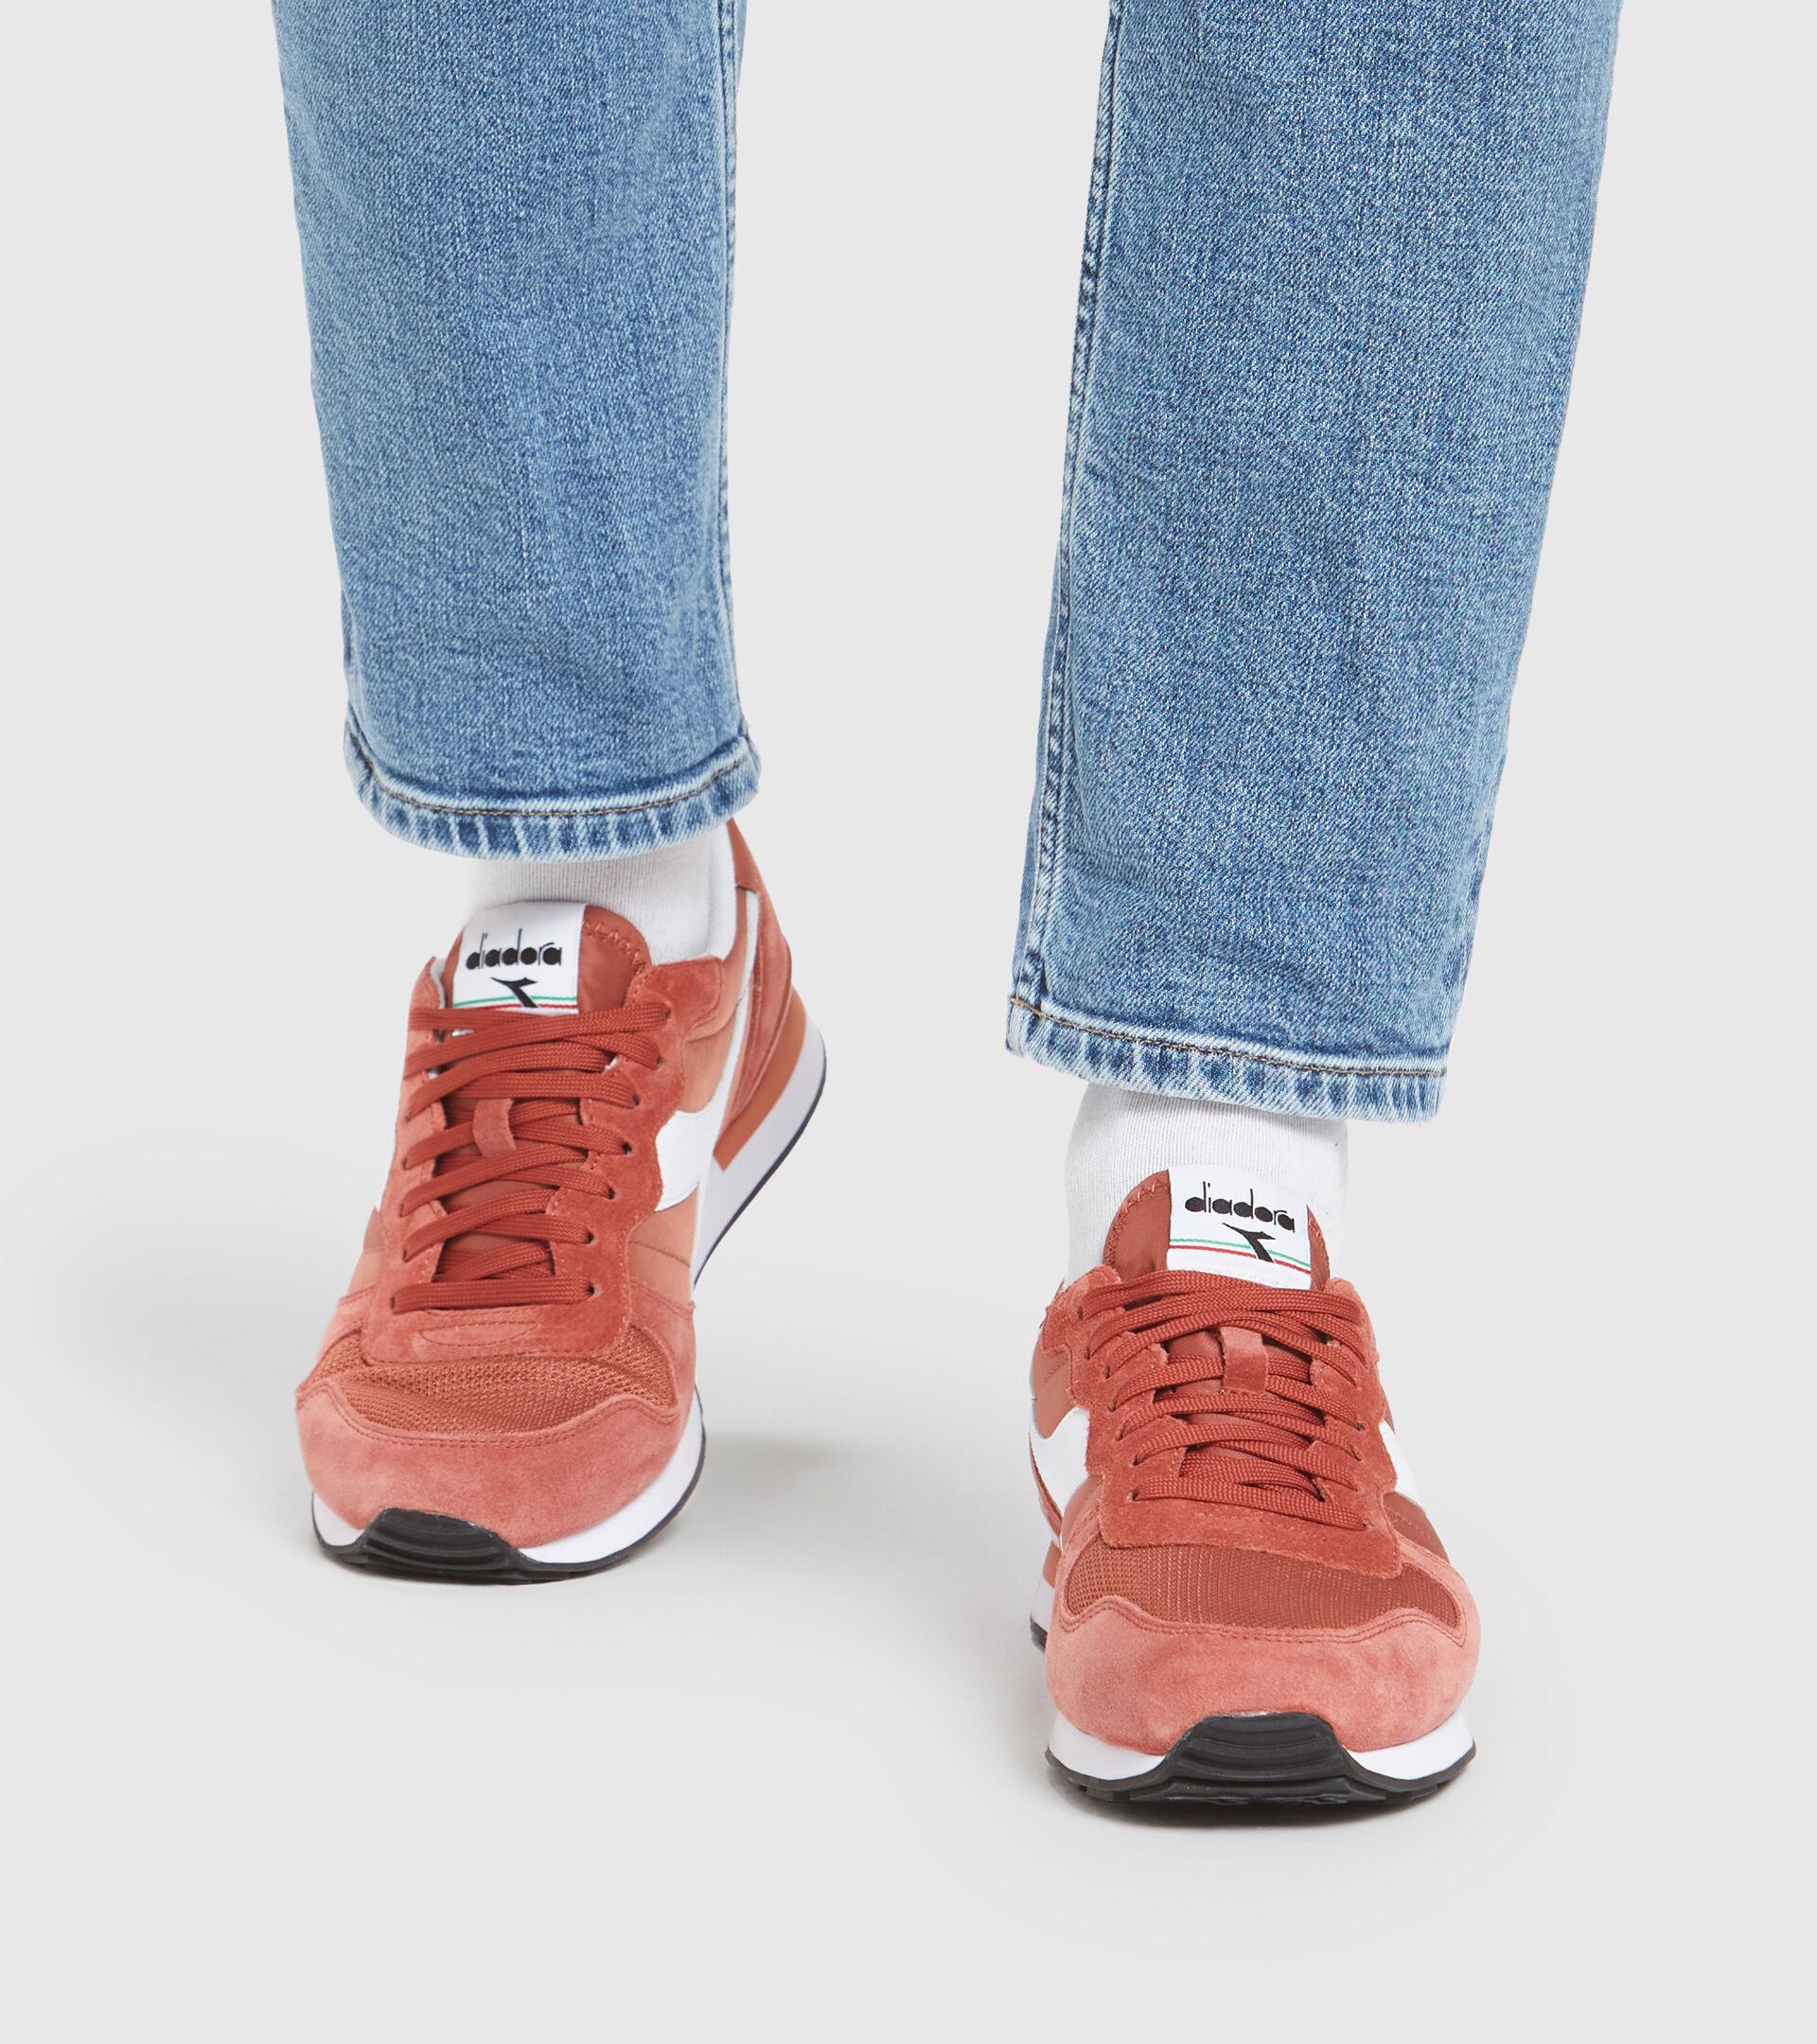 Footwear Sportswear UNISEX CAMARO BROWN TABASCO Diadora